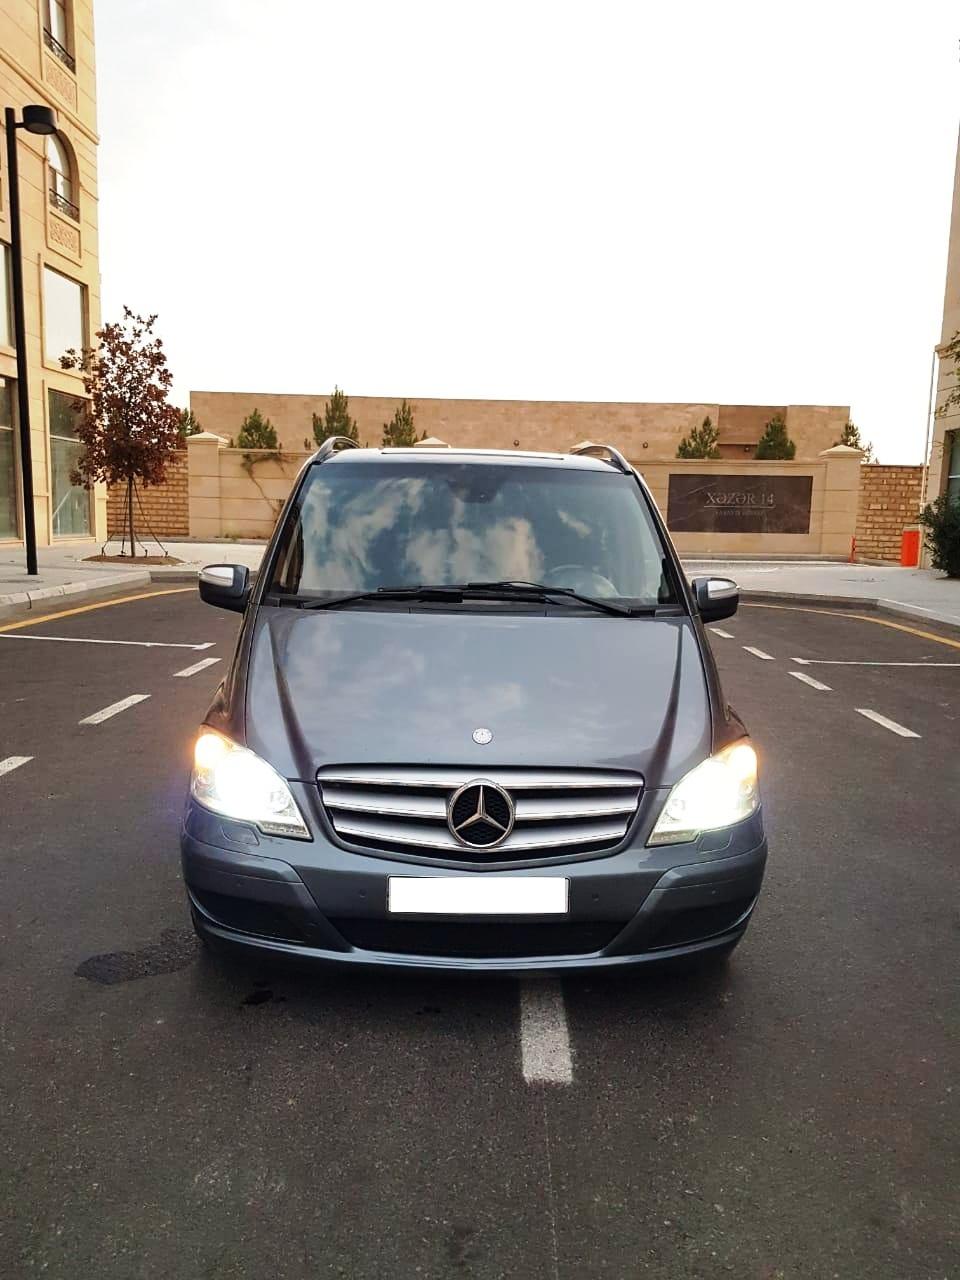 Mercedes-Benz Viano 3.0(lt) 2013 Second hand  $28500